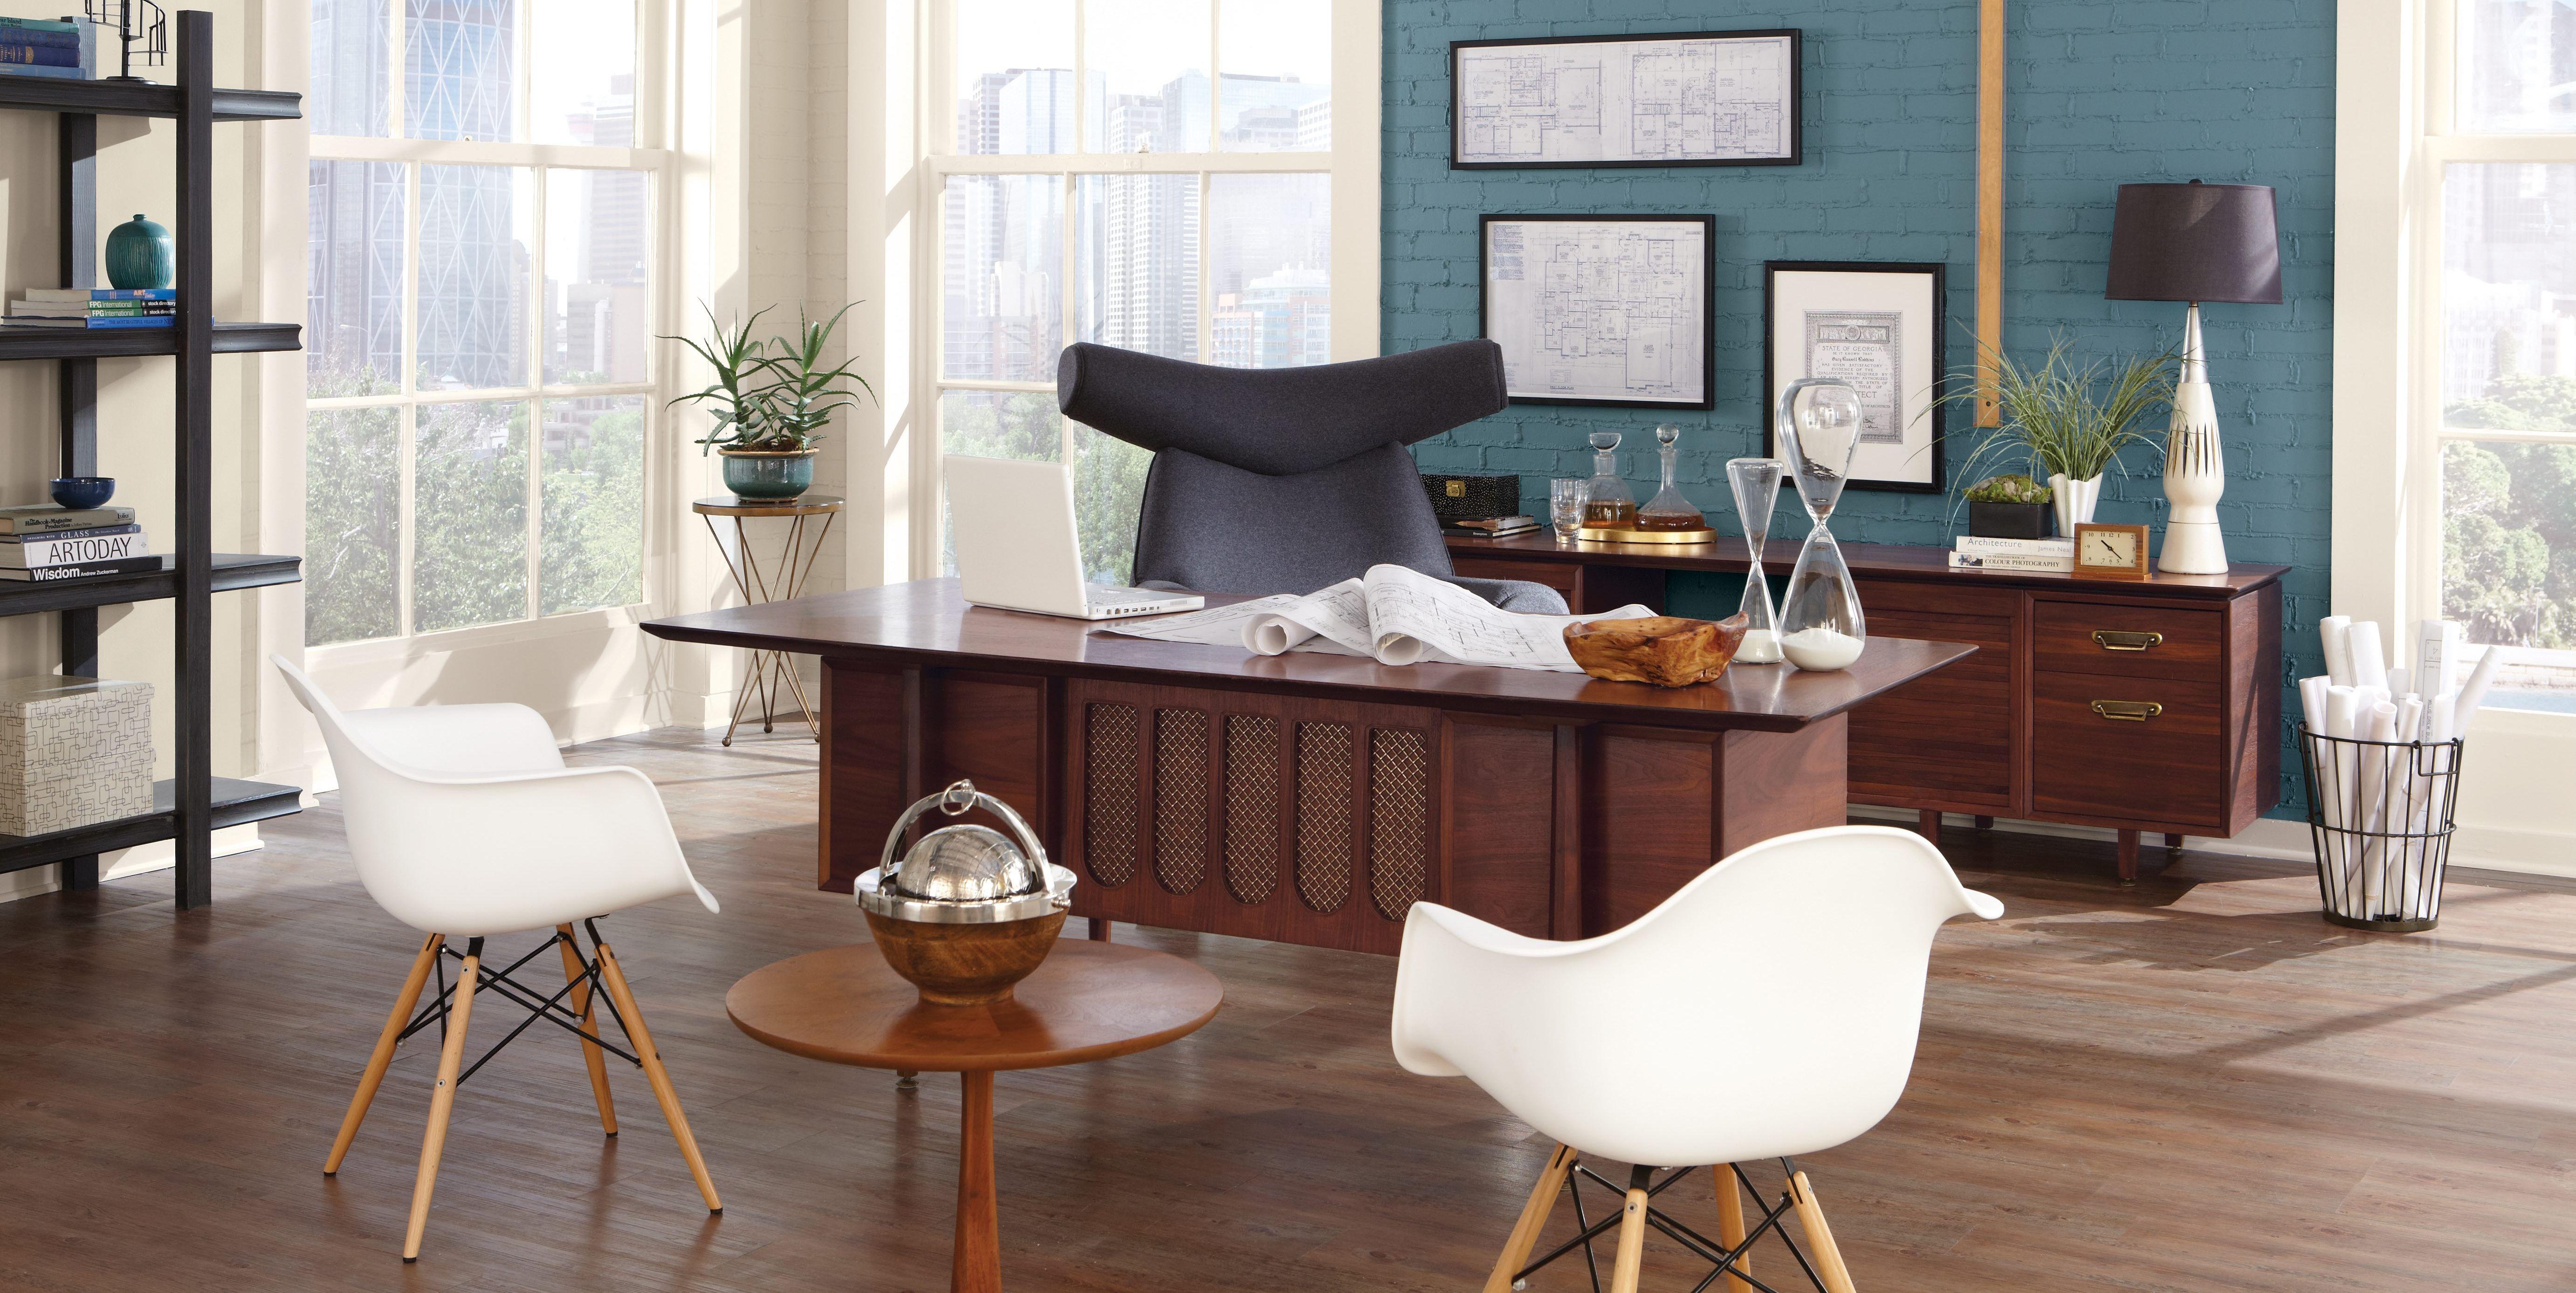 Workspace Design - Office Decor